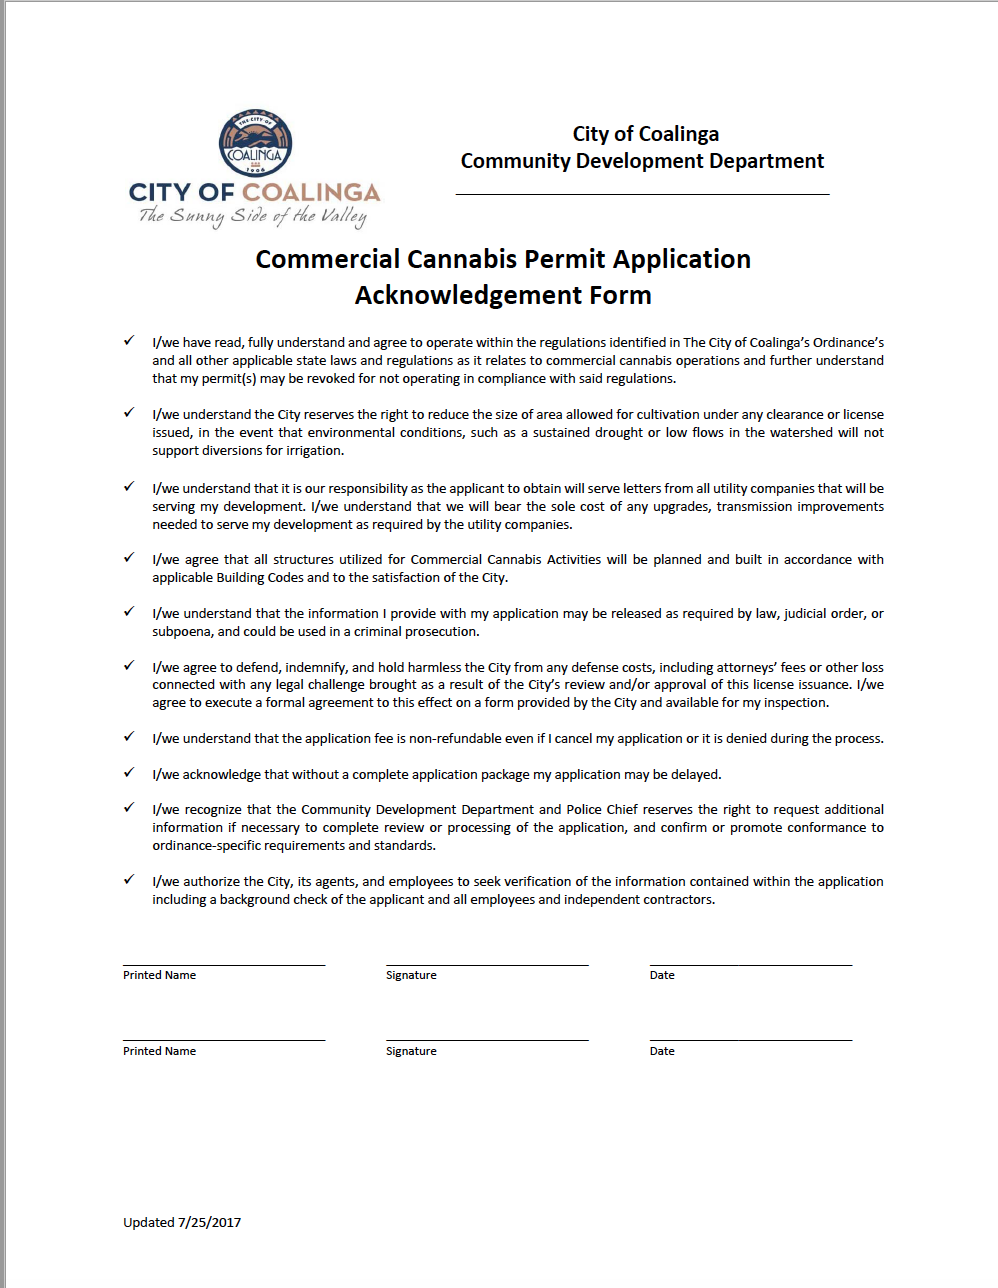 Permit Acknowledgement Form.png